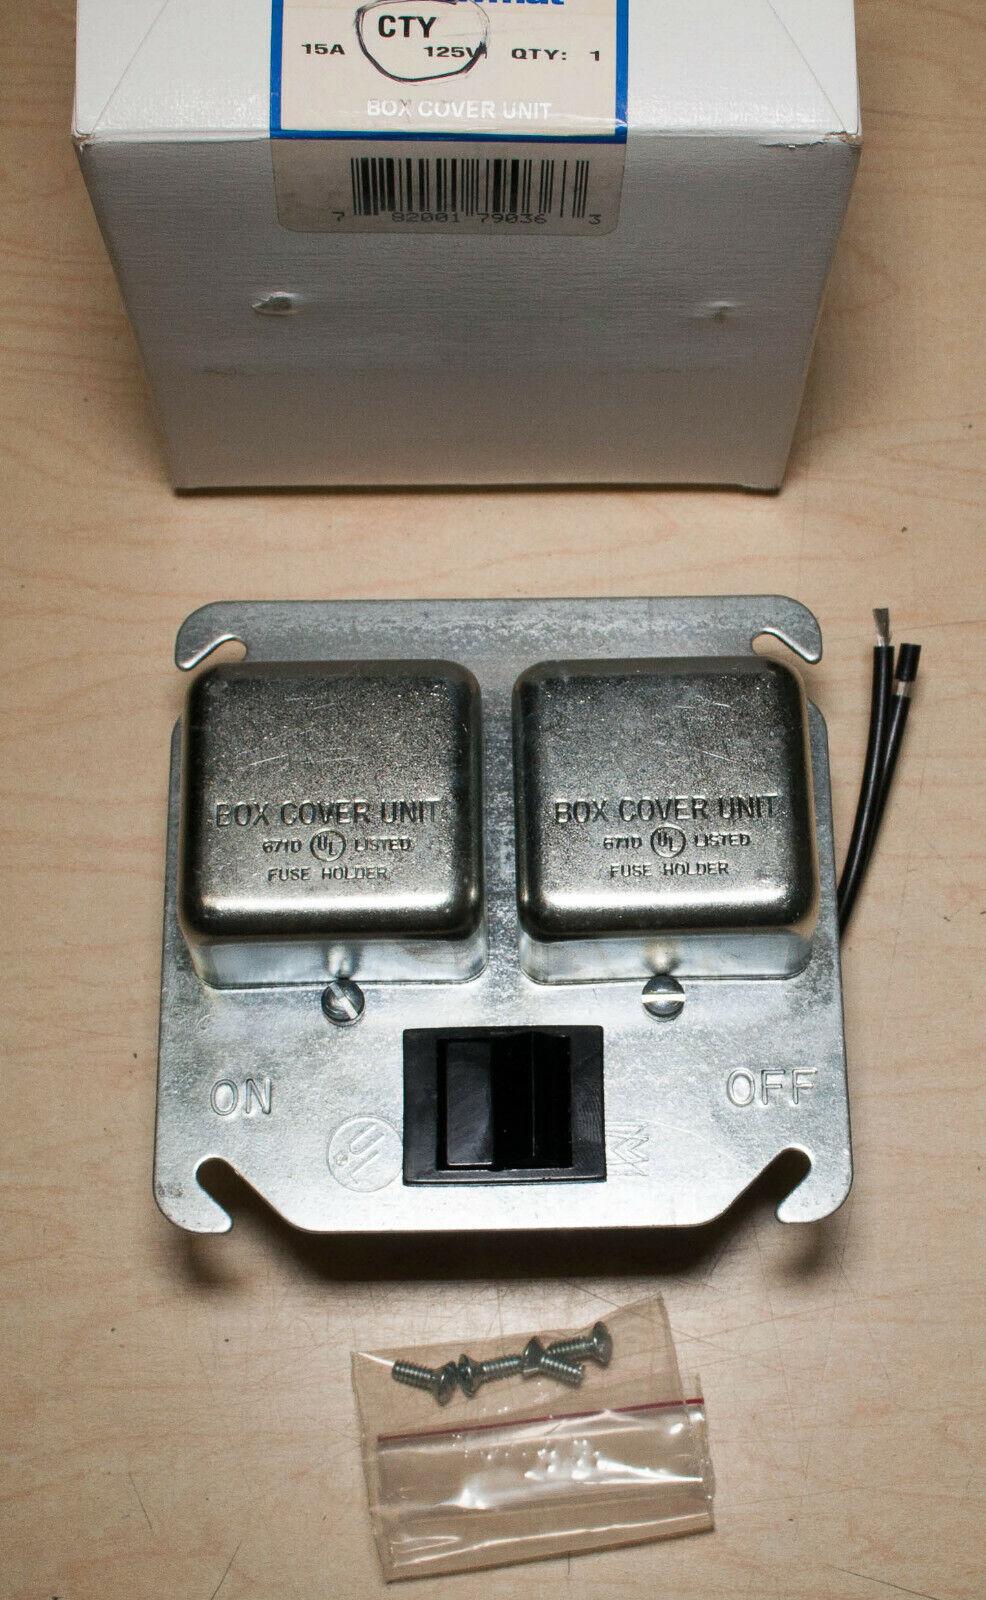 Ferraz Shawmut CTY Box Cover Unit 15A 125V - $49.99